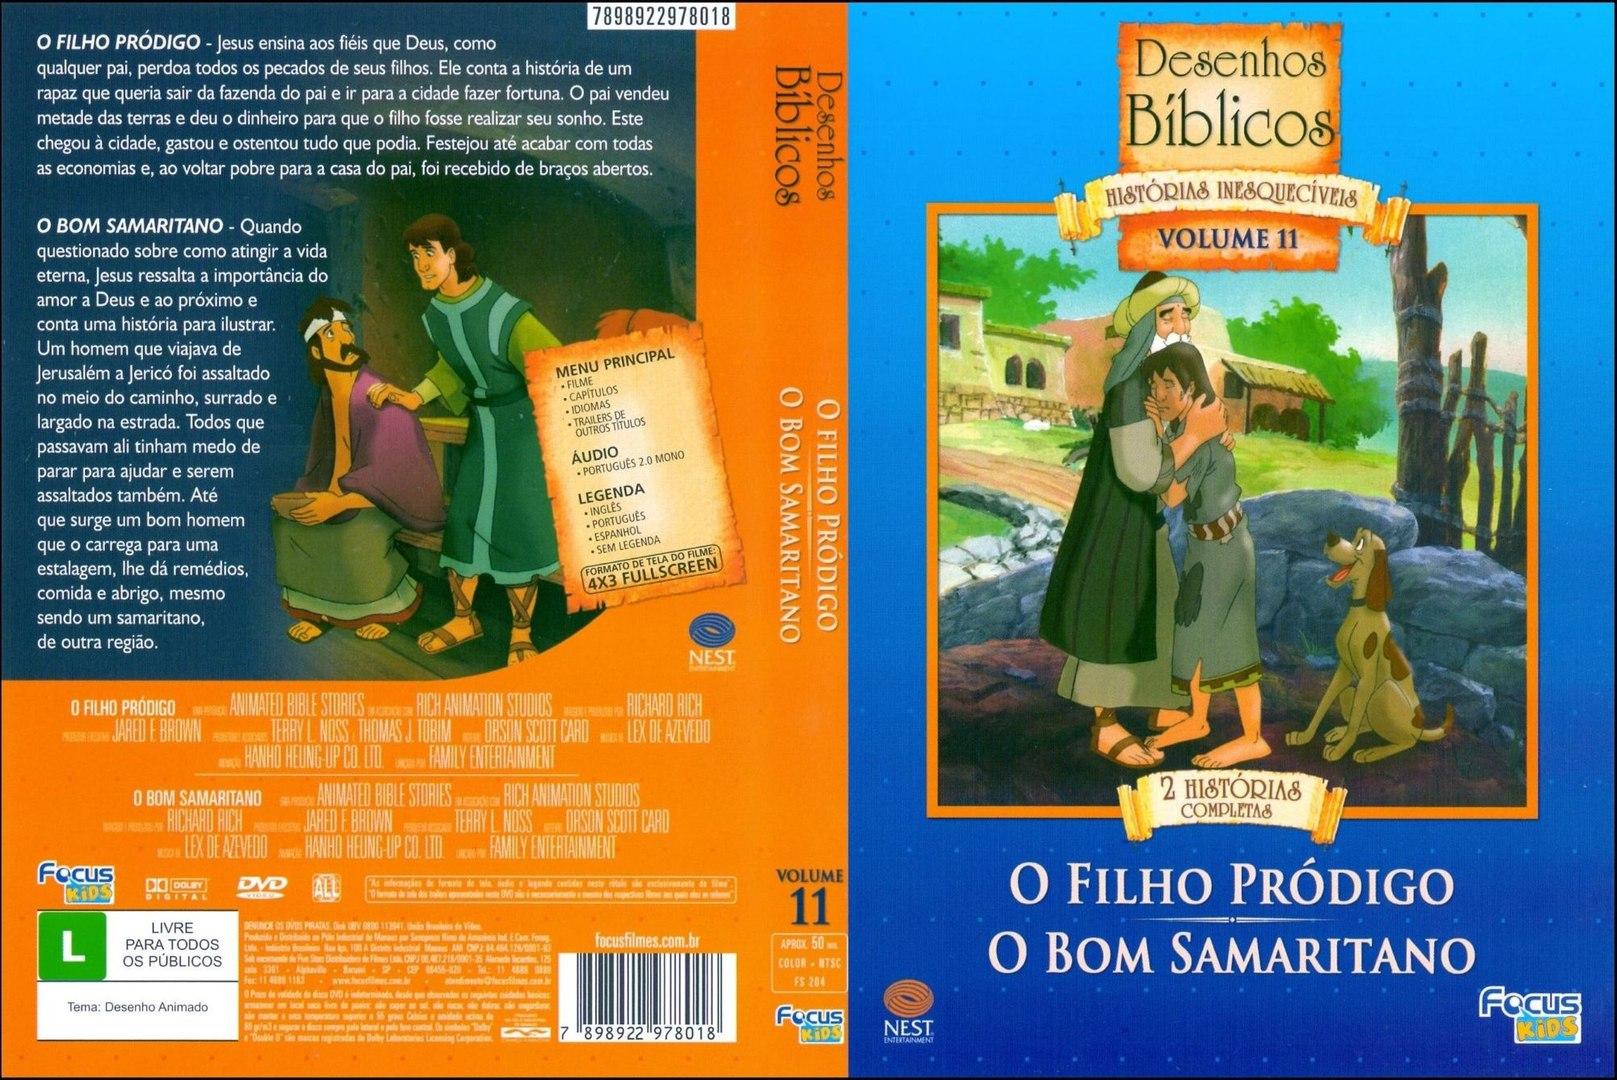 BIBLICO SAMARITANO BAIXAR BOM DESENHO